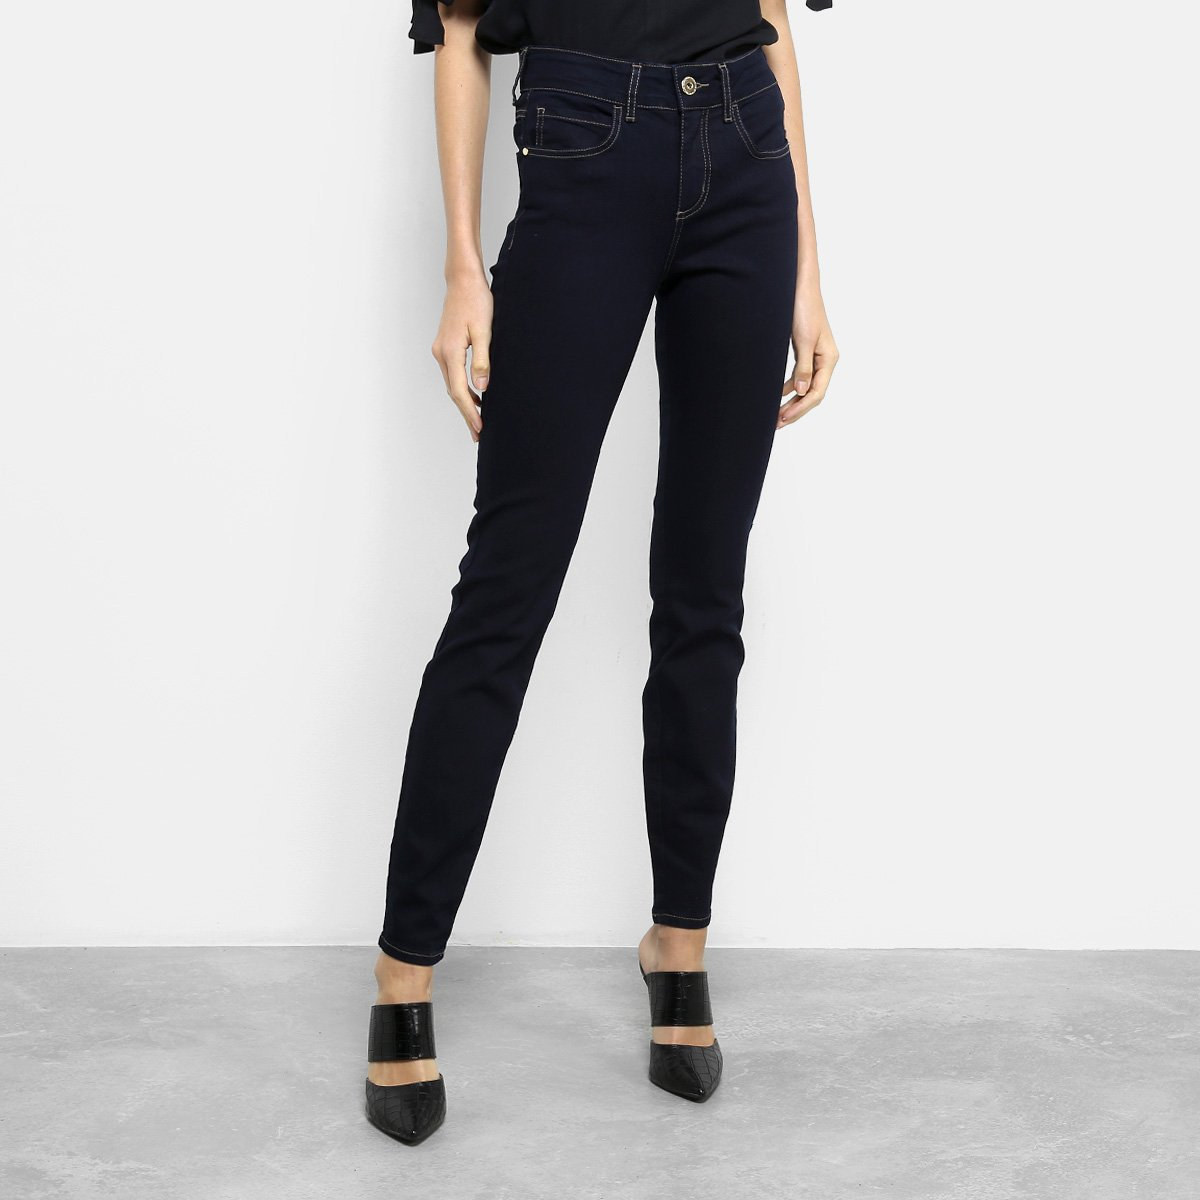 caef22cf5 Calça Jeans Skinny Colcci Cory Cintura Média Feminina